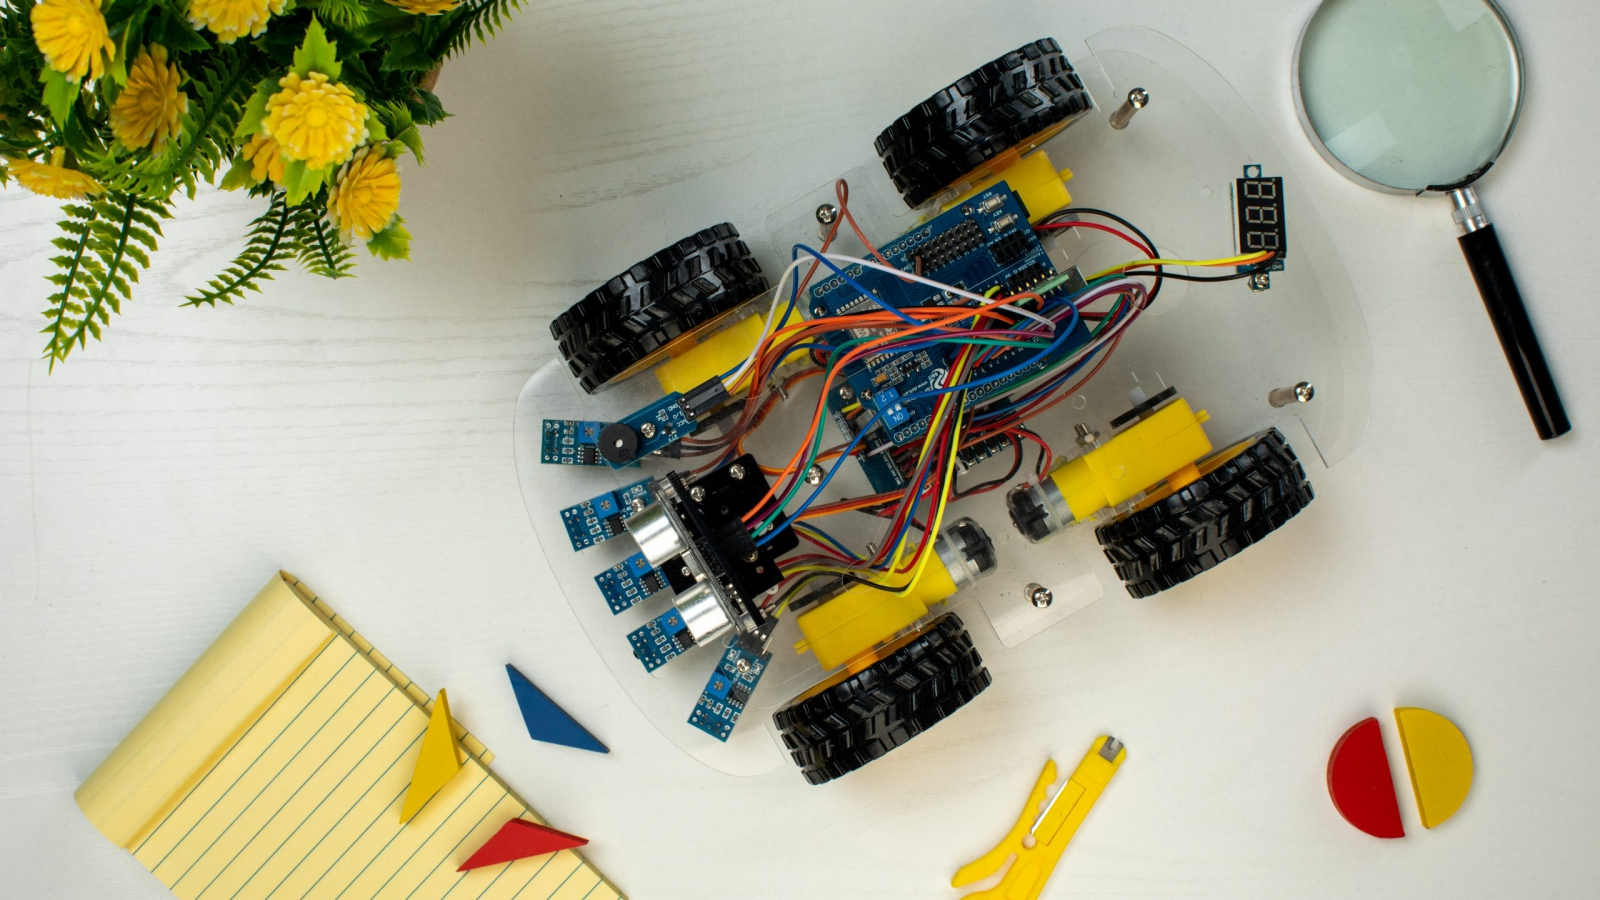 robot style car with joystick